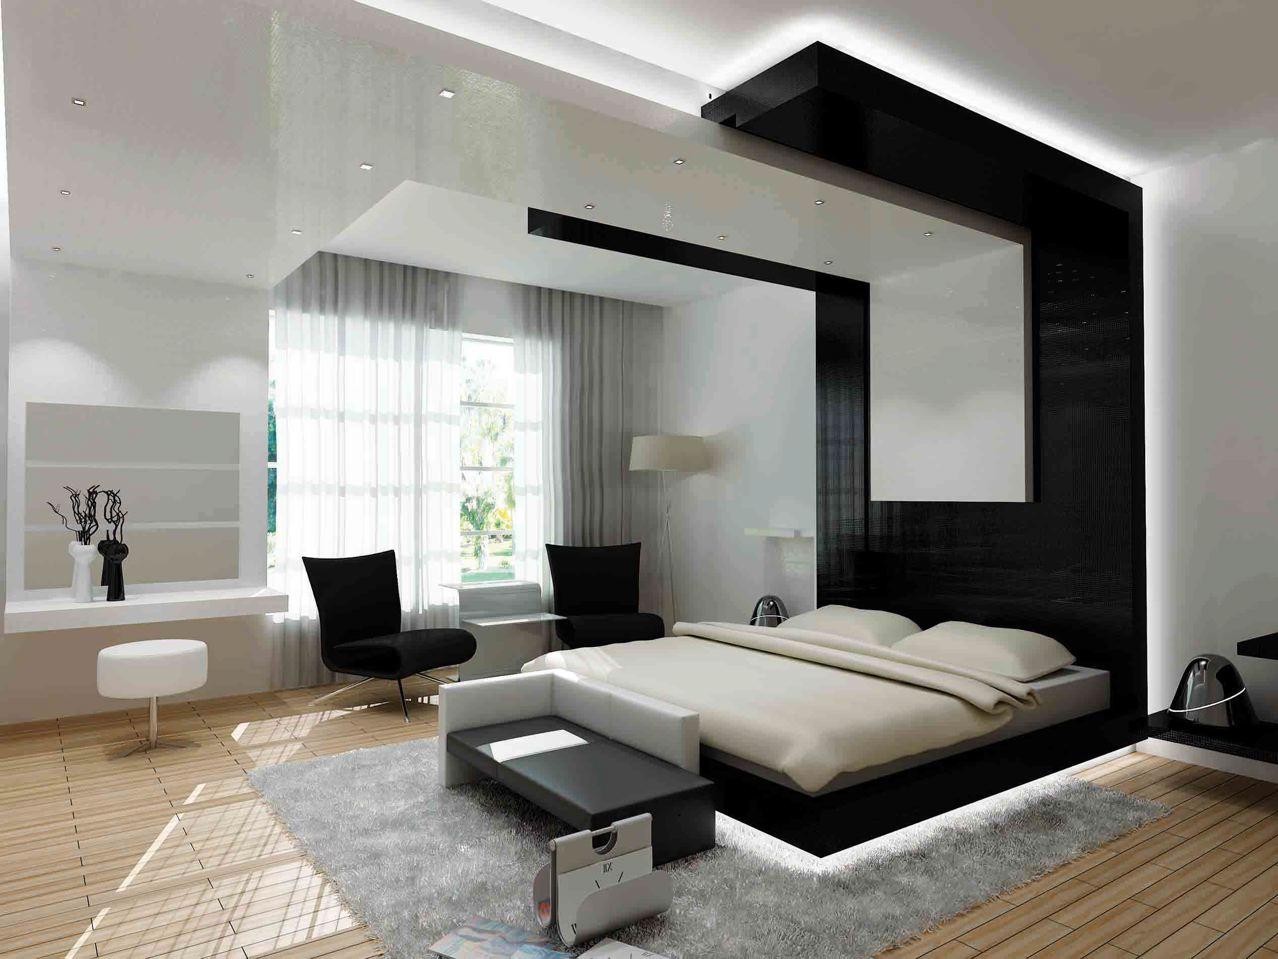 25 Best Bedroom Designs Ideas - The WoW Style on Simple Best Bedroom Design  id=23336